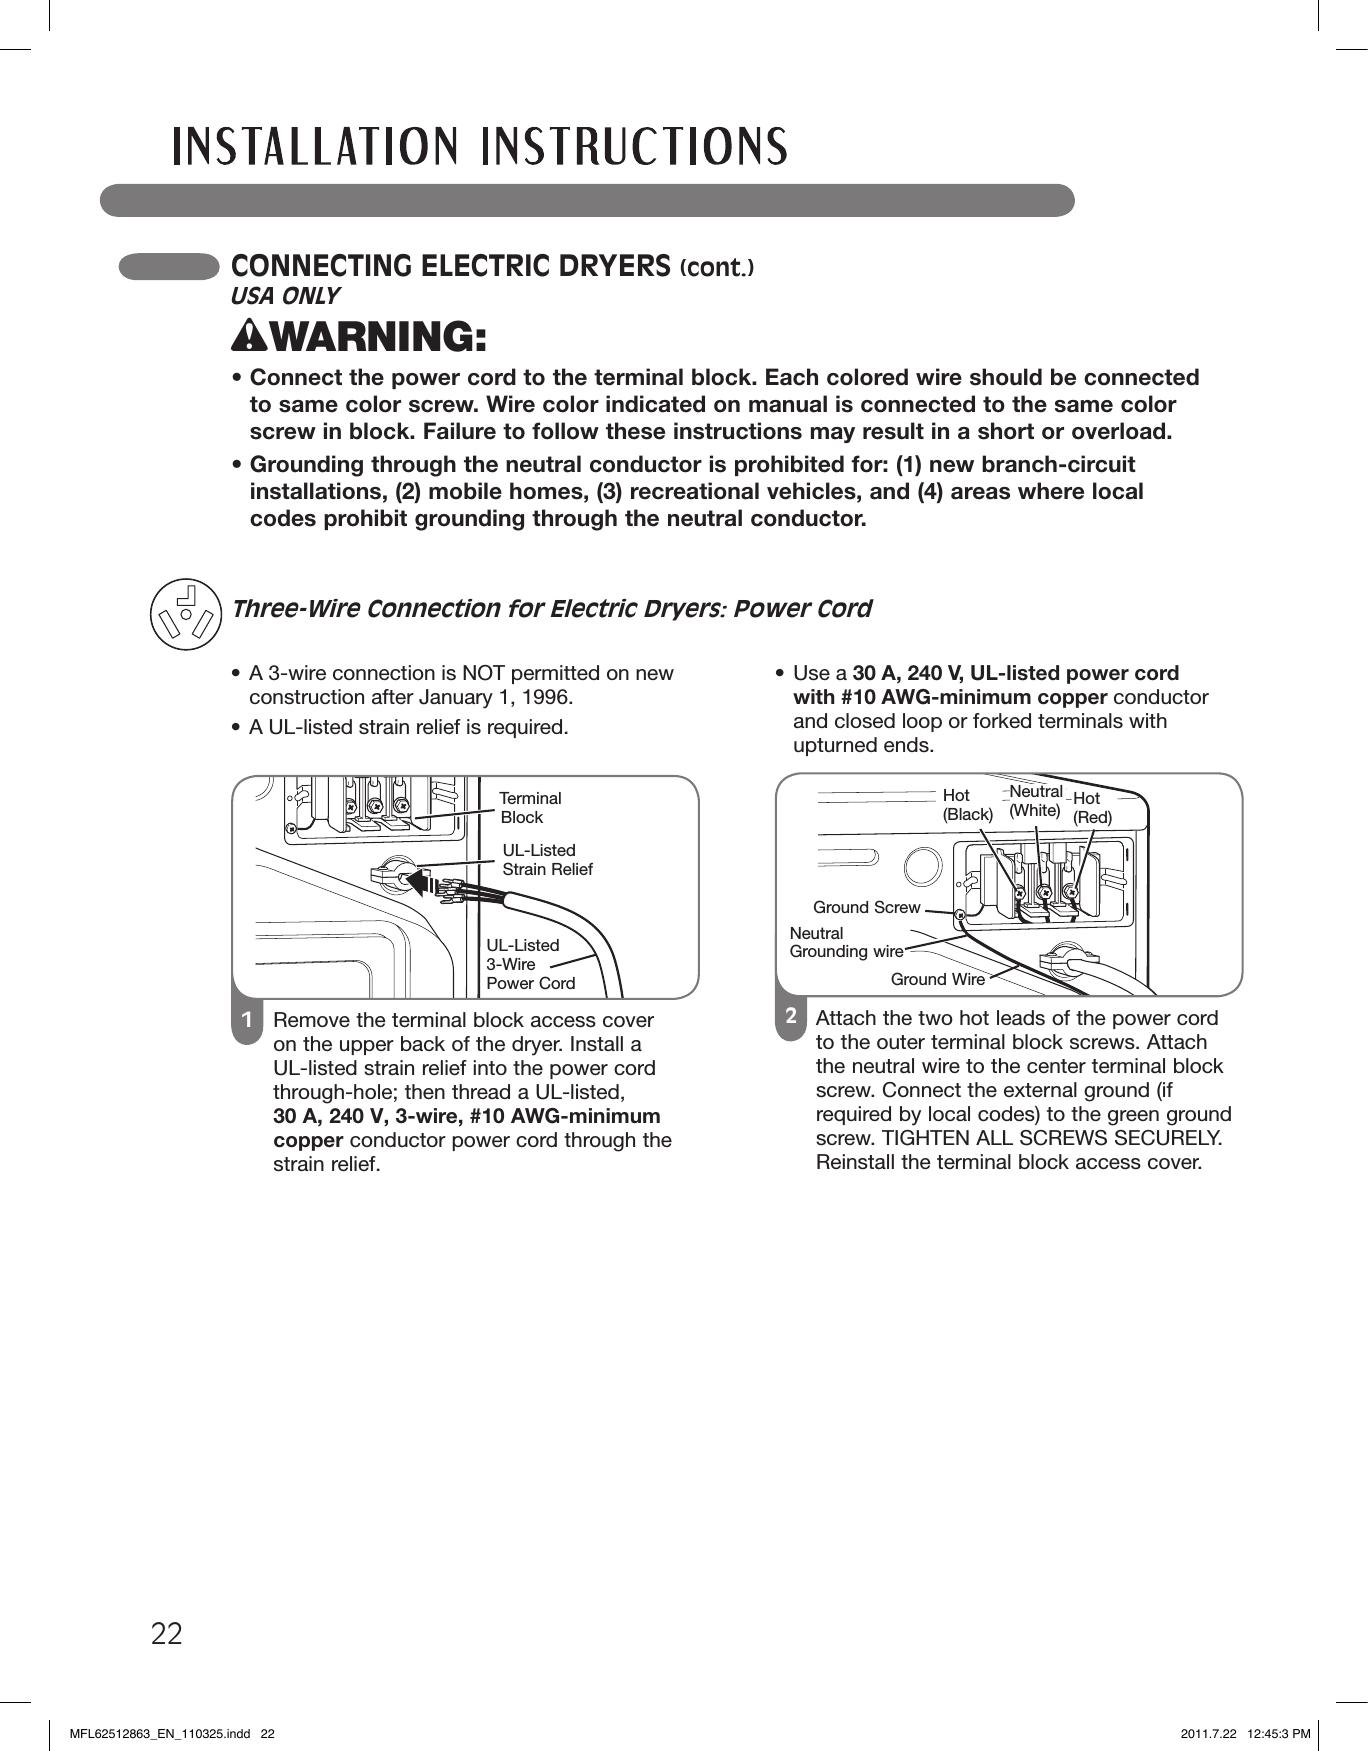 Exelent Electrical Neutral Color Frieze - Wiring Diagram Ideas ...